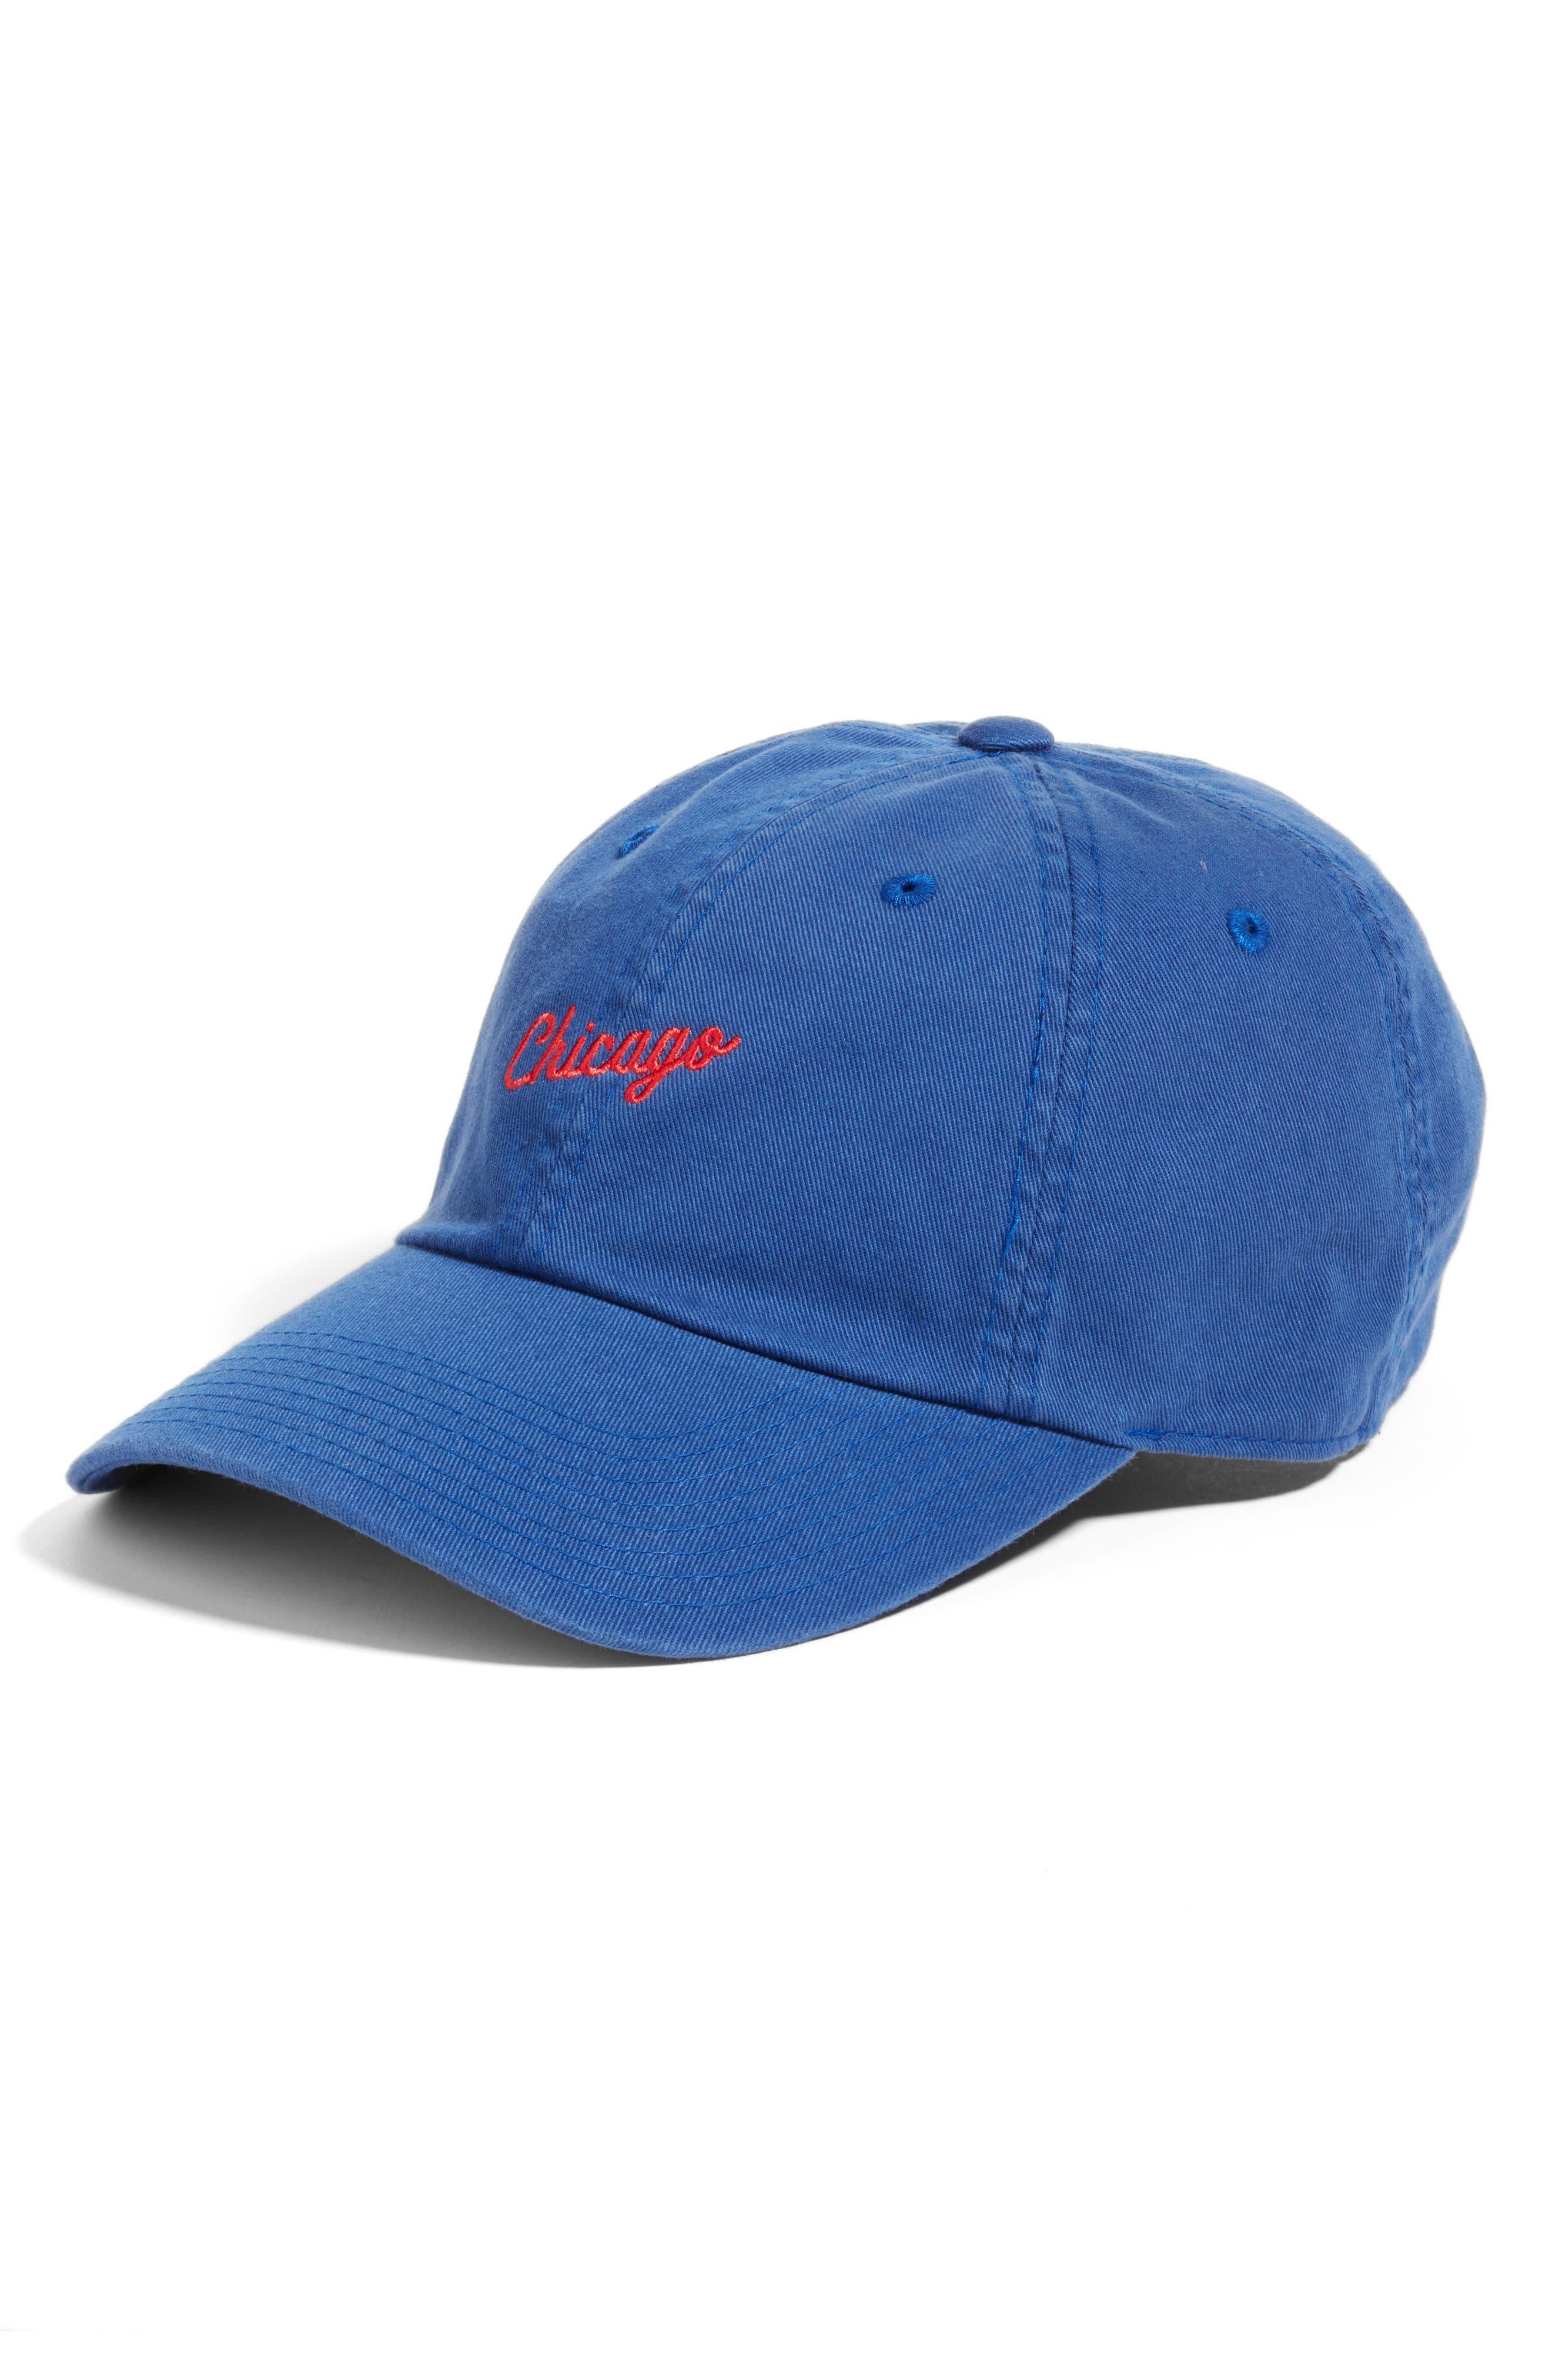 Boardshort - Chicago Baseball Cap,                         Main,                         color, 400